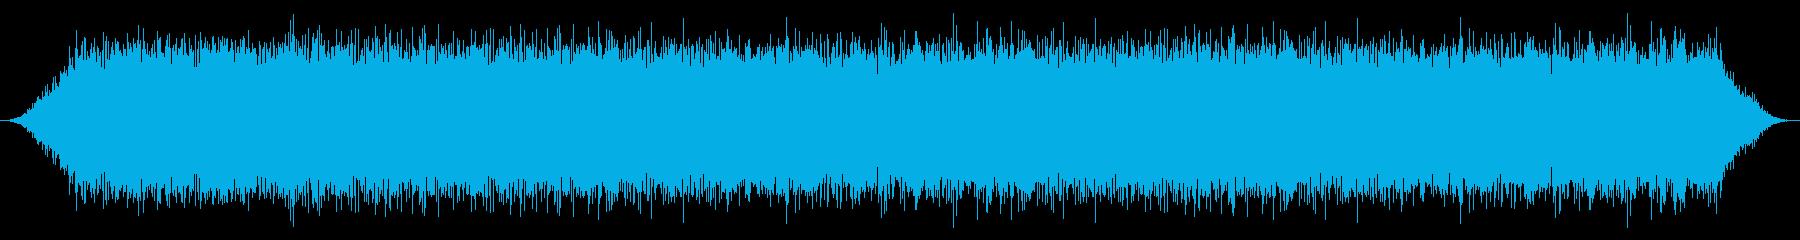 PC 駆動音01-07(ロング)の再生済みの波形